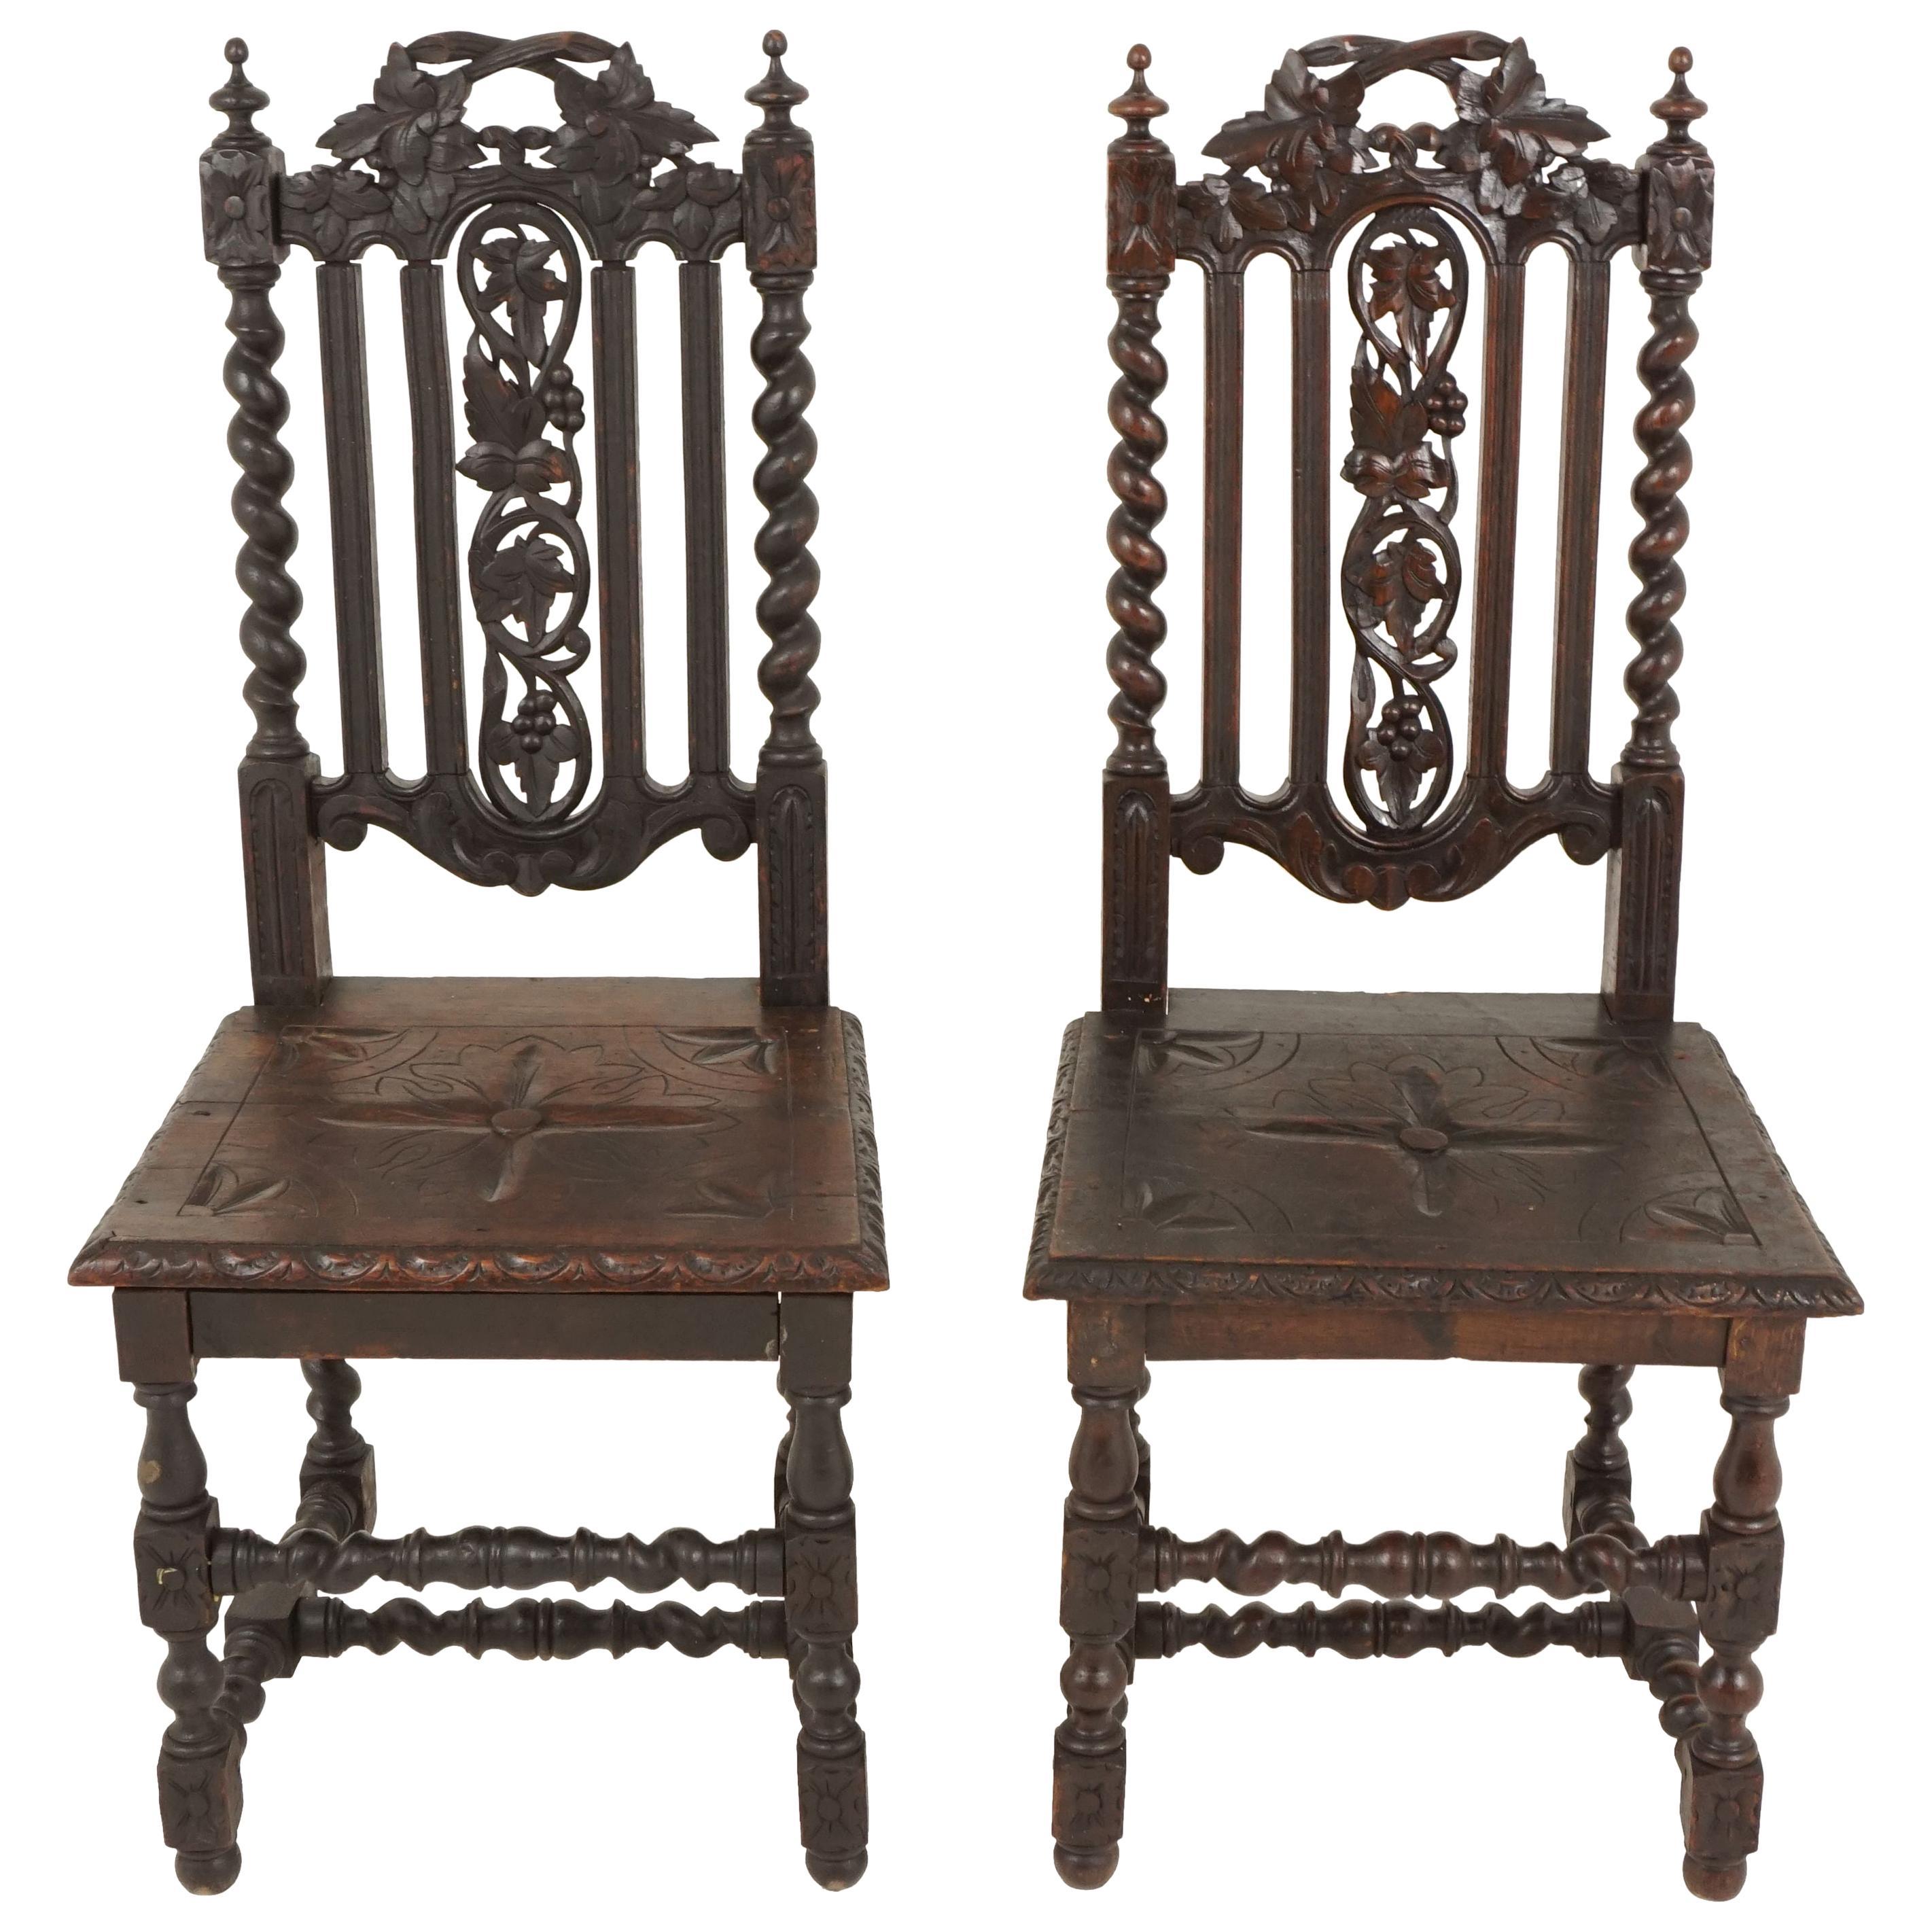 Pair of Antique Victorian Carved Oak Barley Twist Chairs, Scotland 1880, B2484